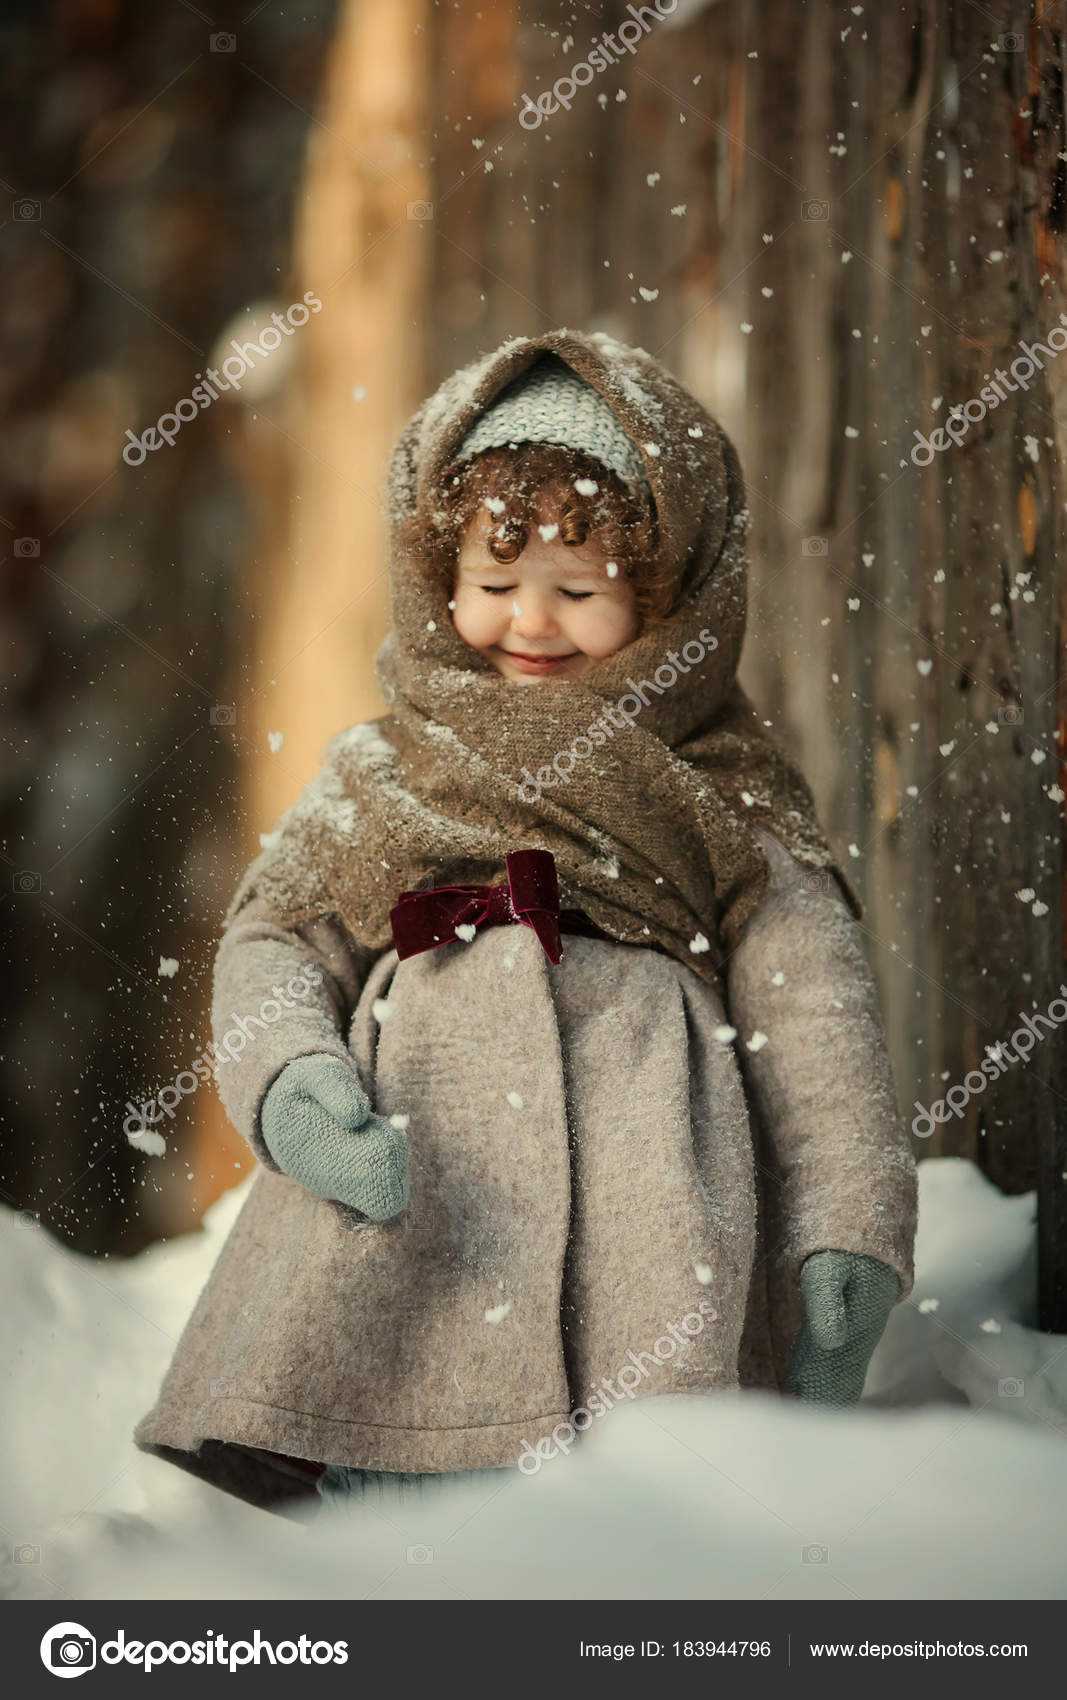 ead23ef90 Outdoor Portrait Cute Smiling Little Girl Warm Shawl Vintage Coat ...